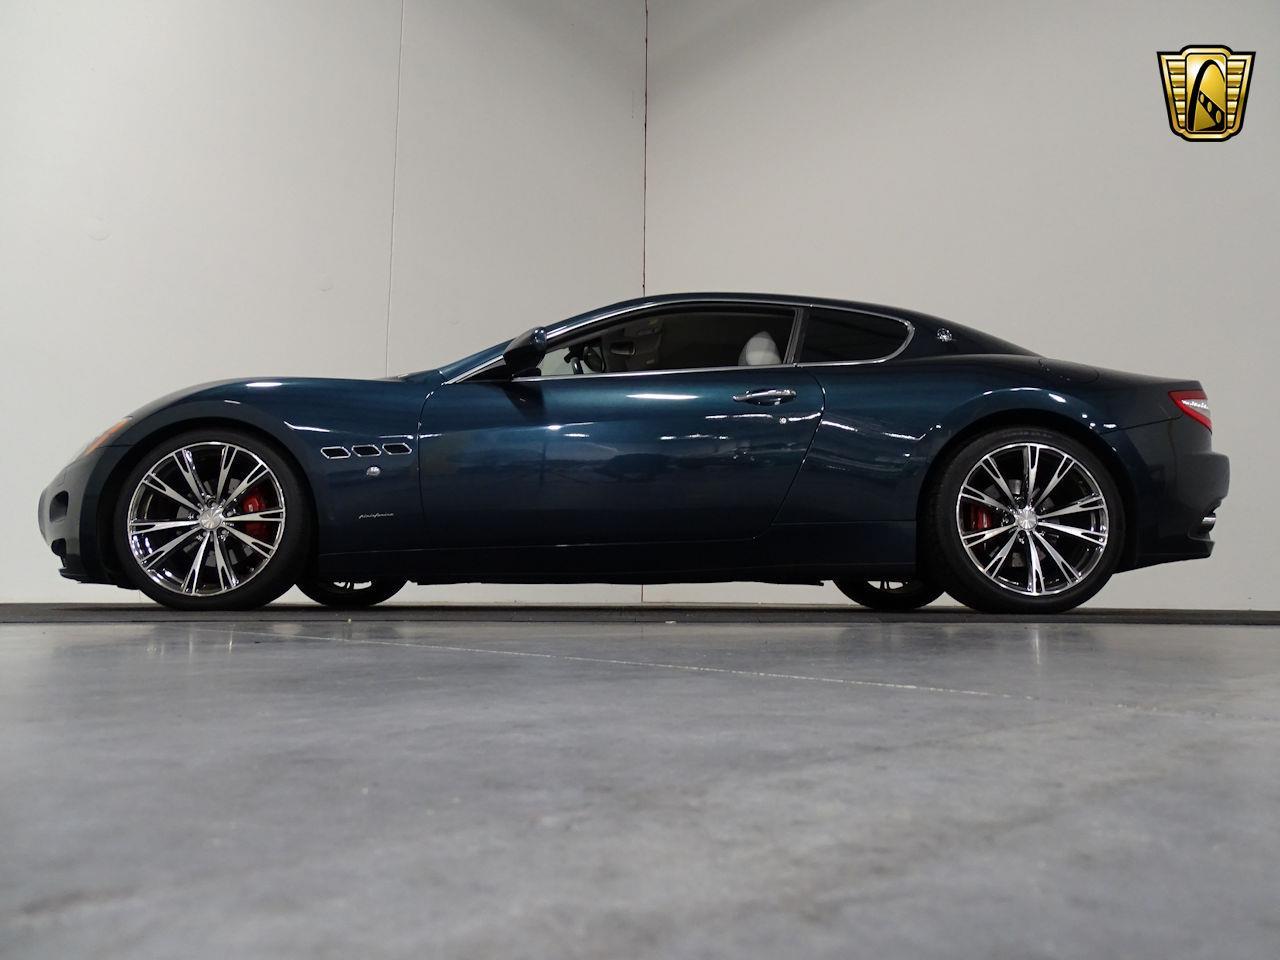 Large Picture of 2008 Maserati GranTurismo located in Texas - $42,995.00 - MO4H